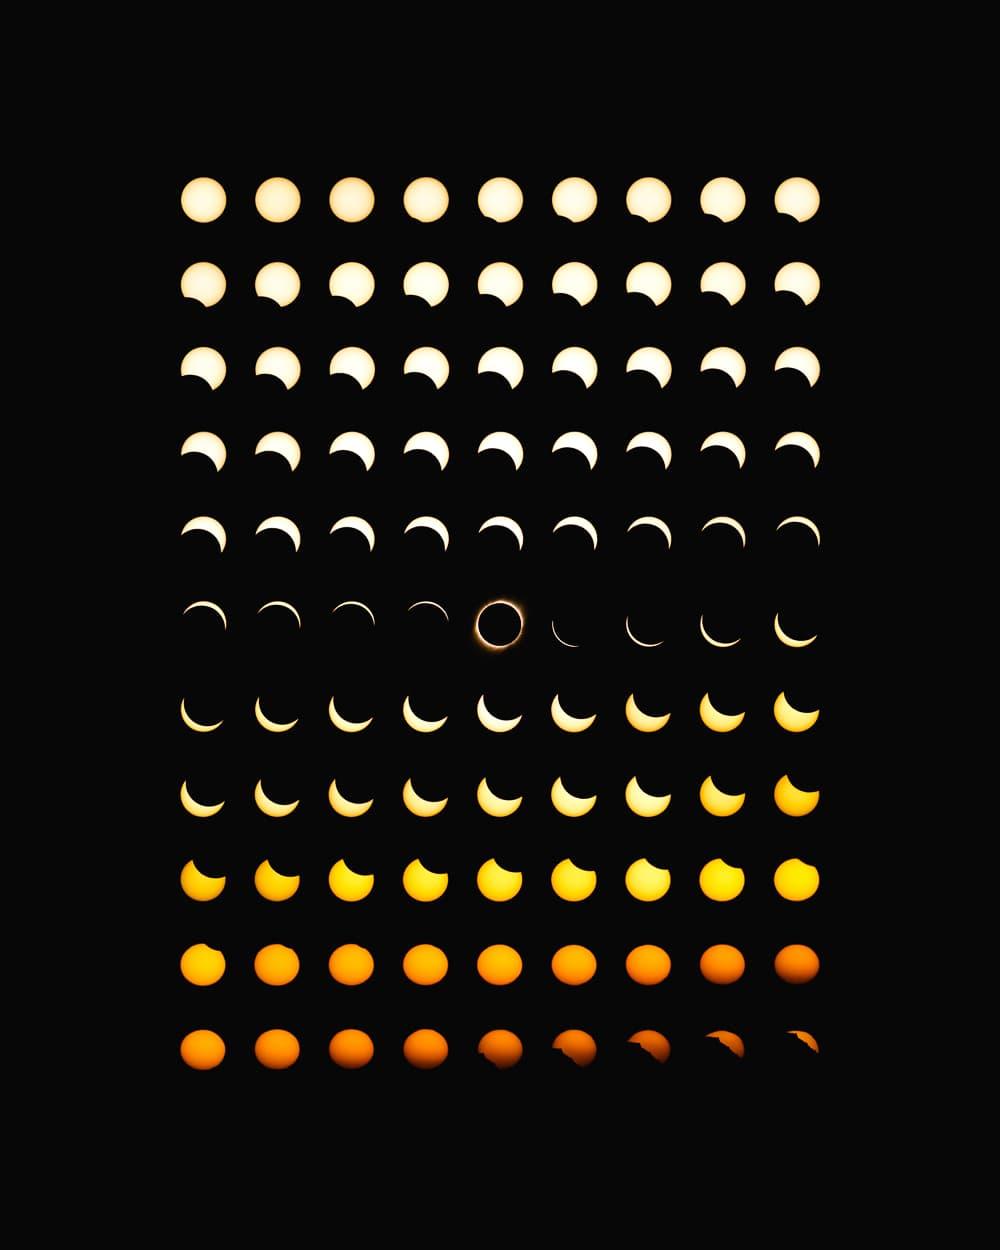 Dan Marker-Moore Sonnenfinsternis 2019